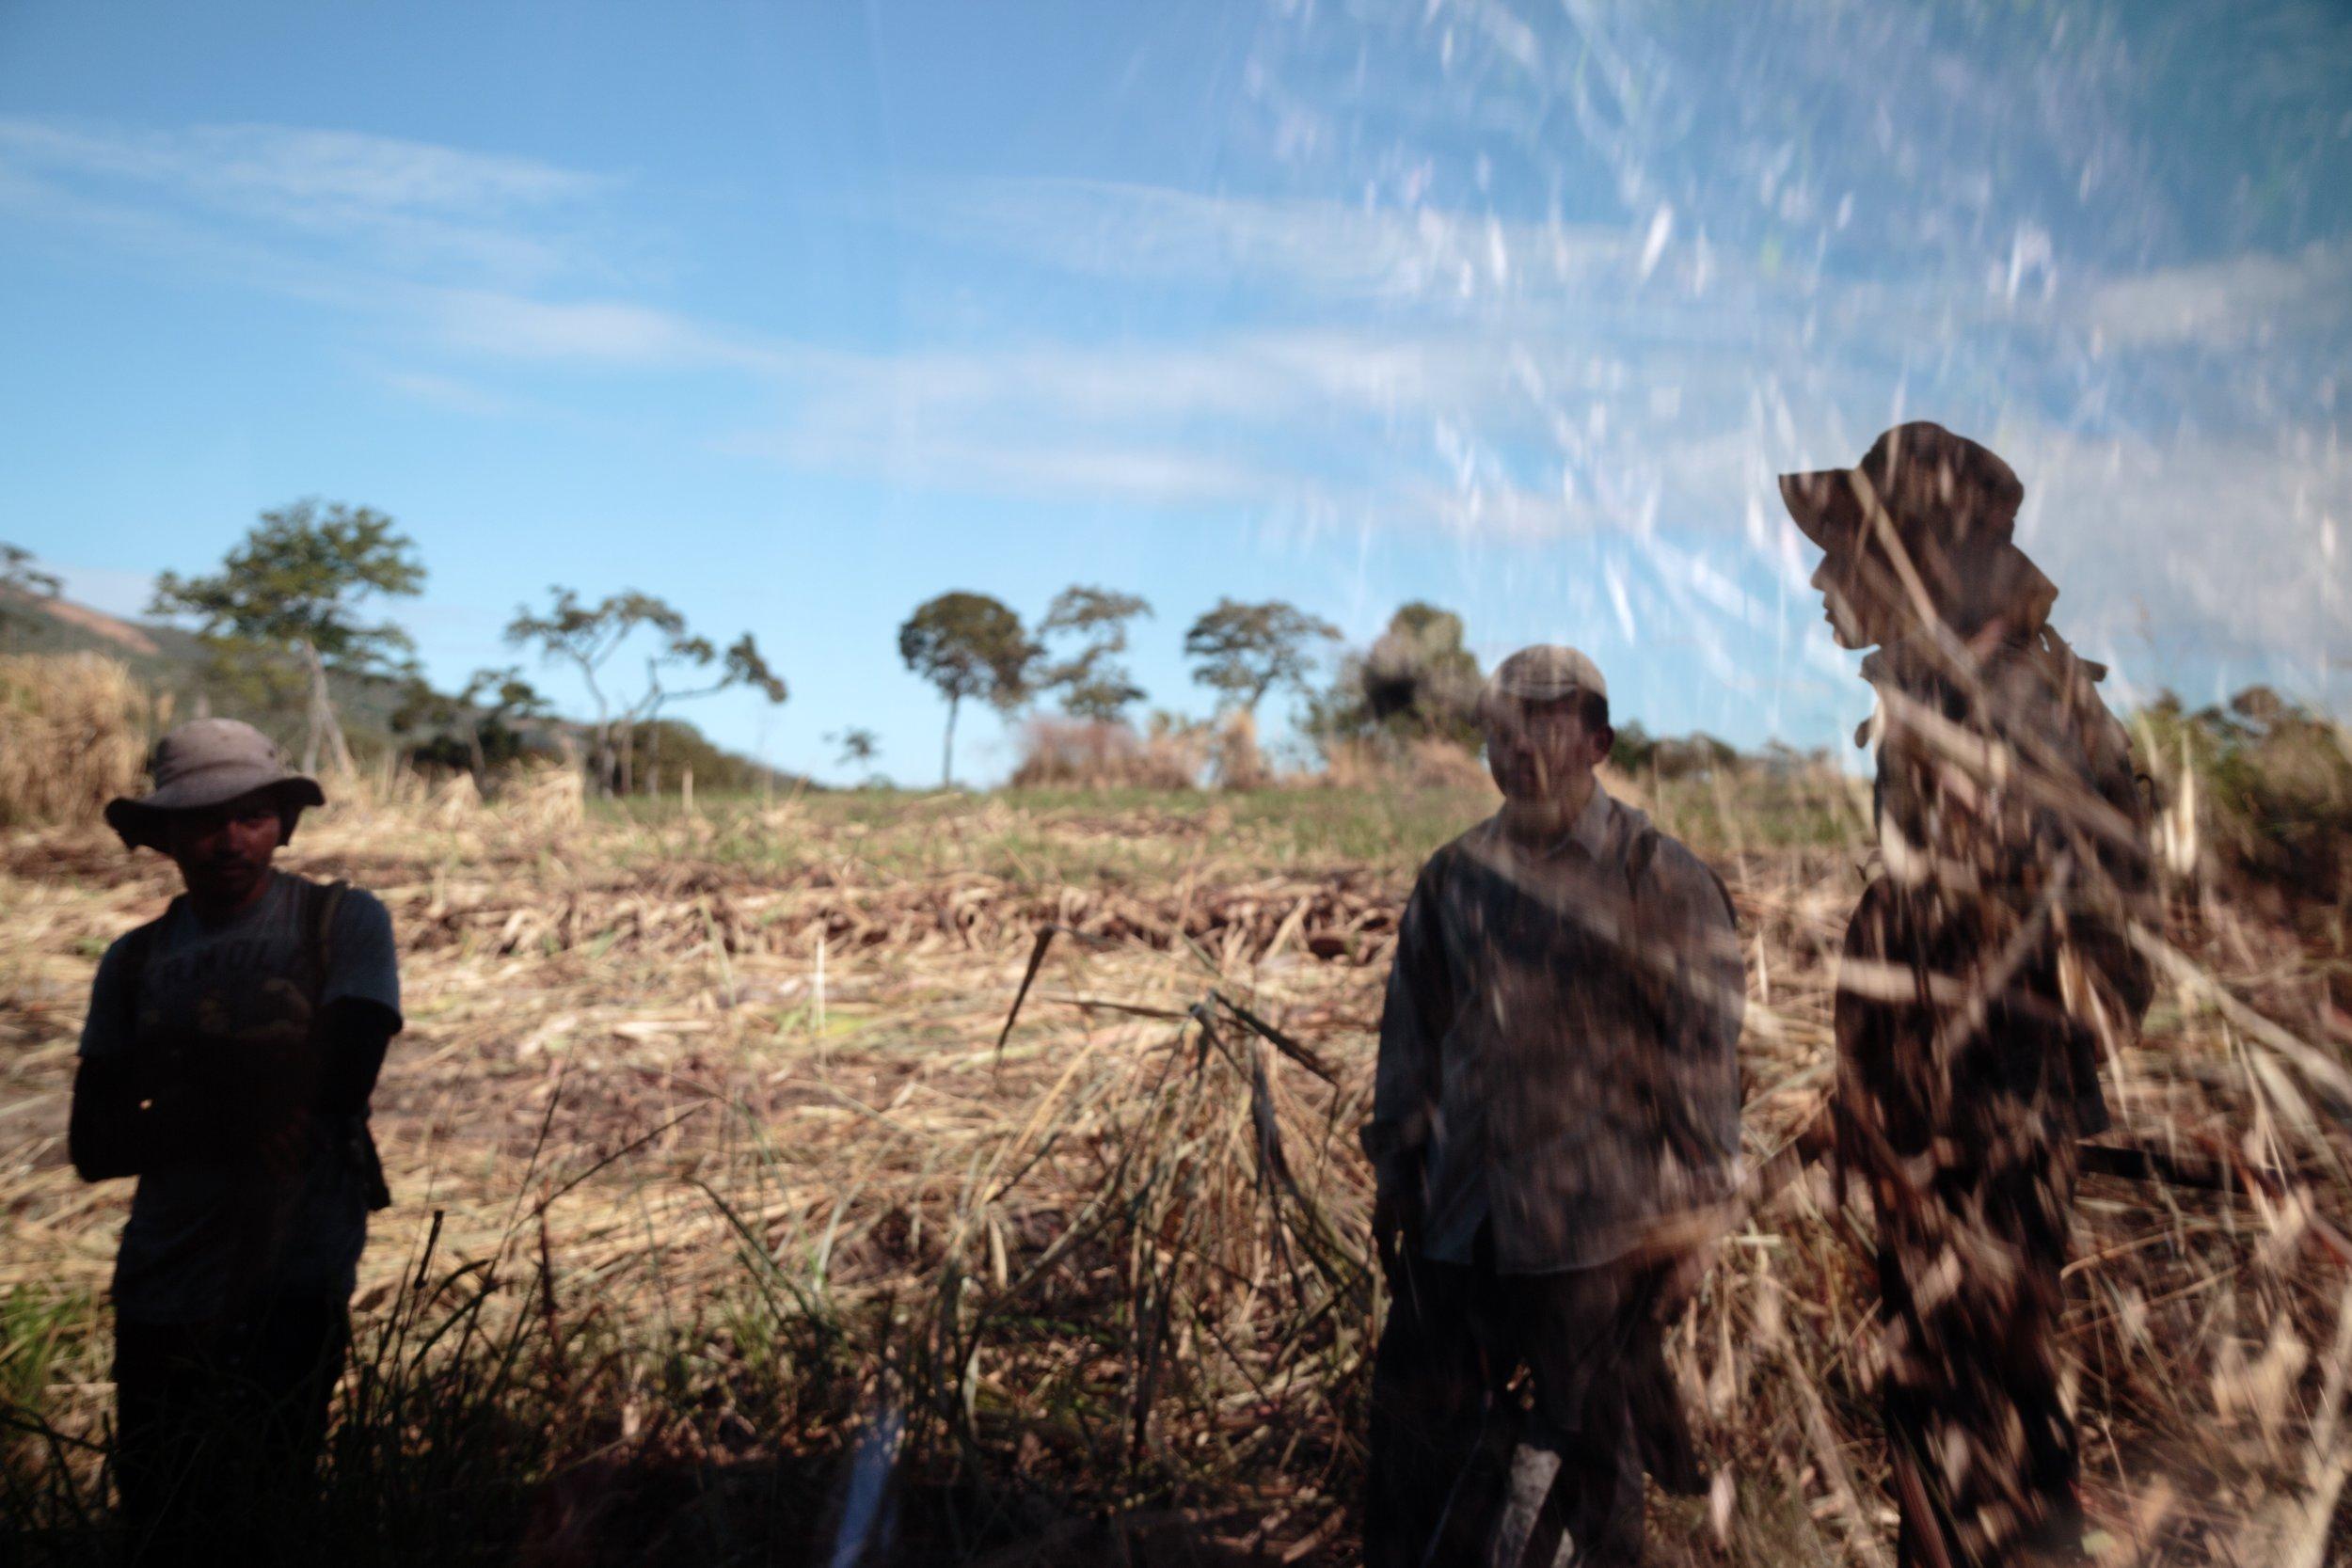 Sugarcane workers take a break in the fields of El Angel Sugar Mill outside of Suchitoto, El Salvador on Jan. 13, 2015.